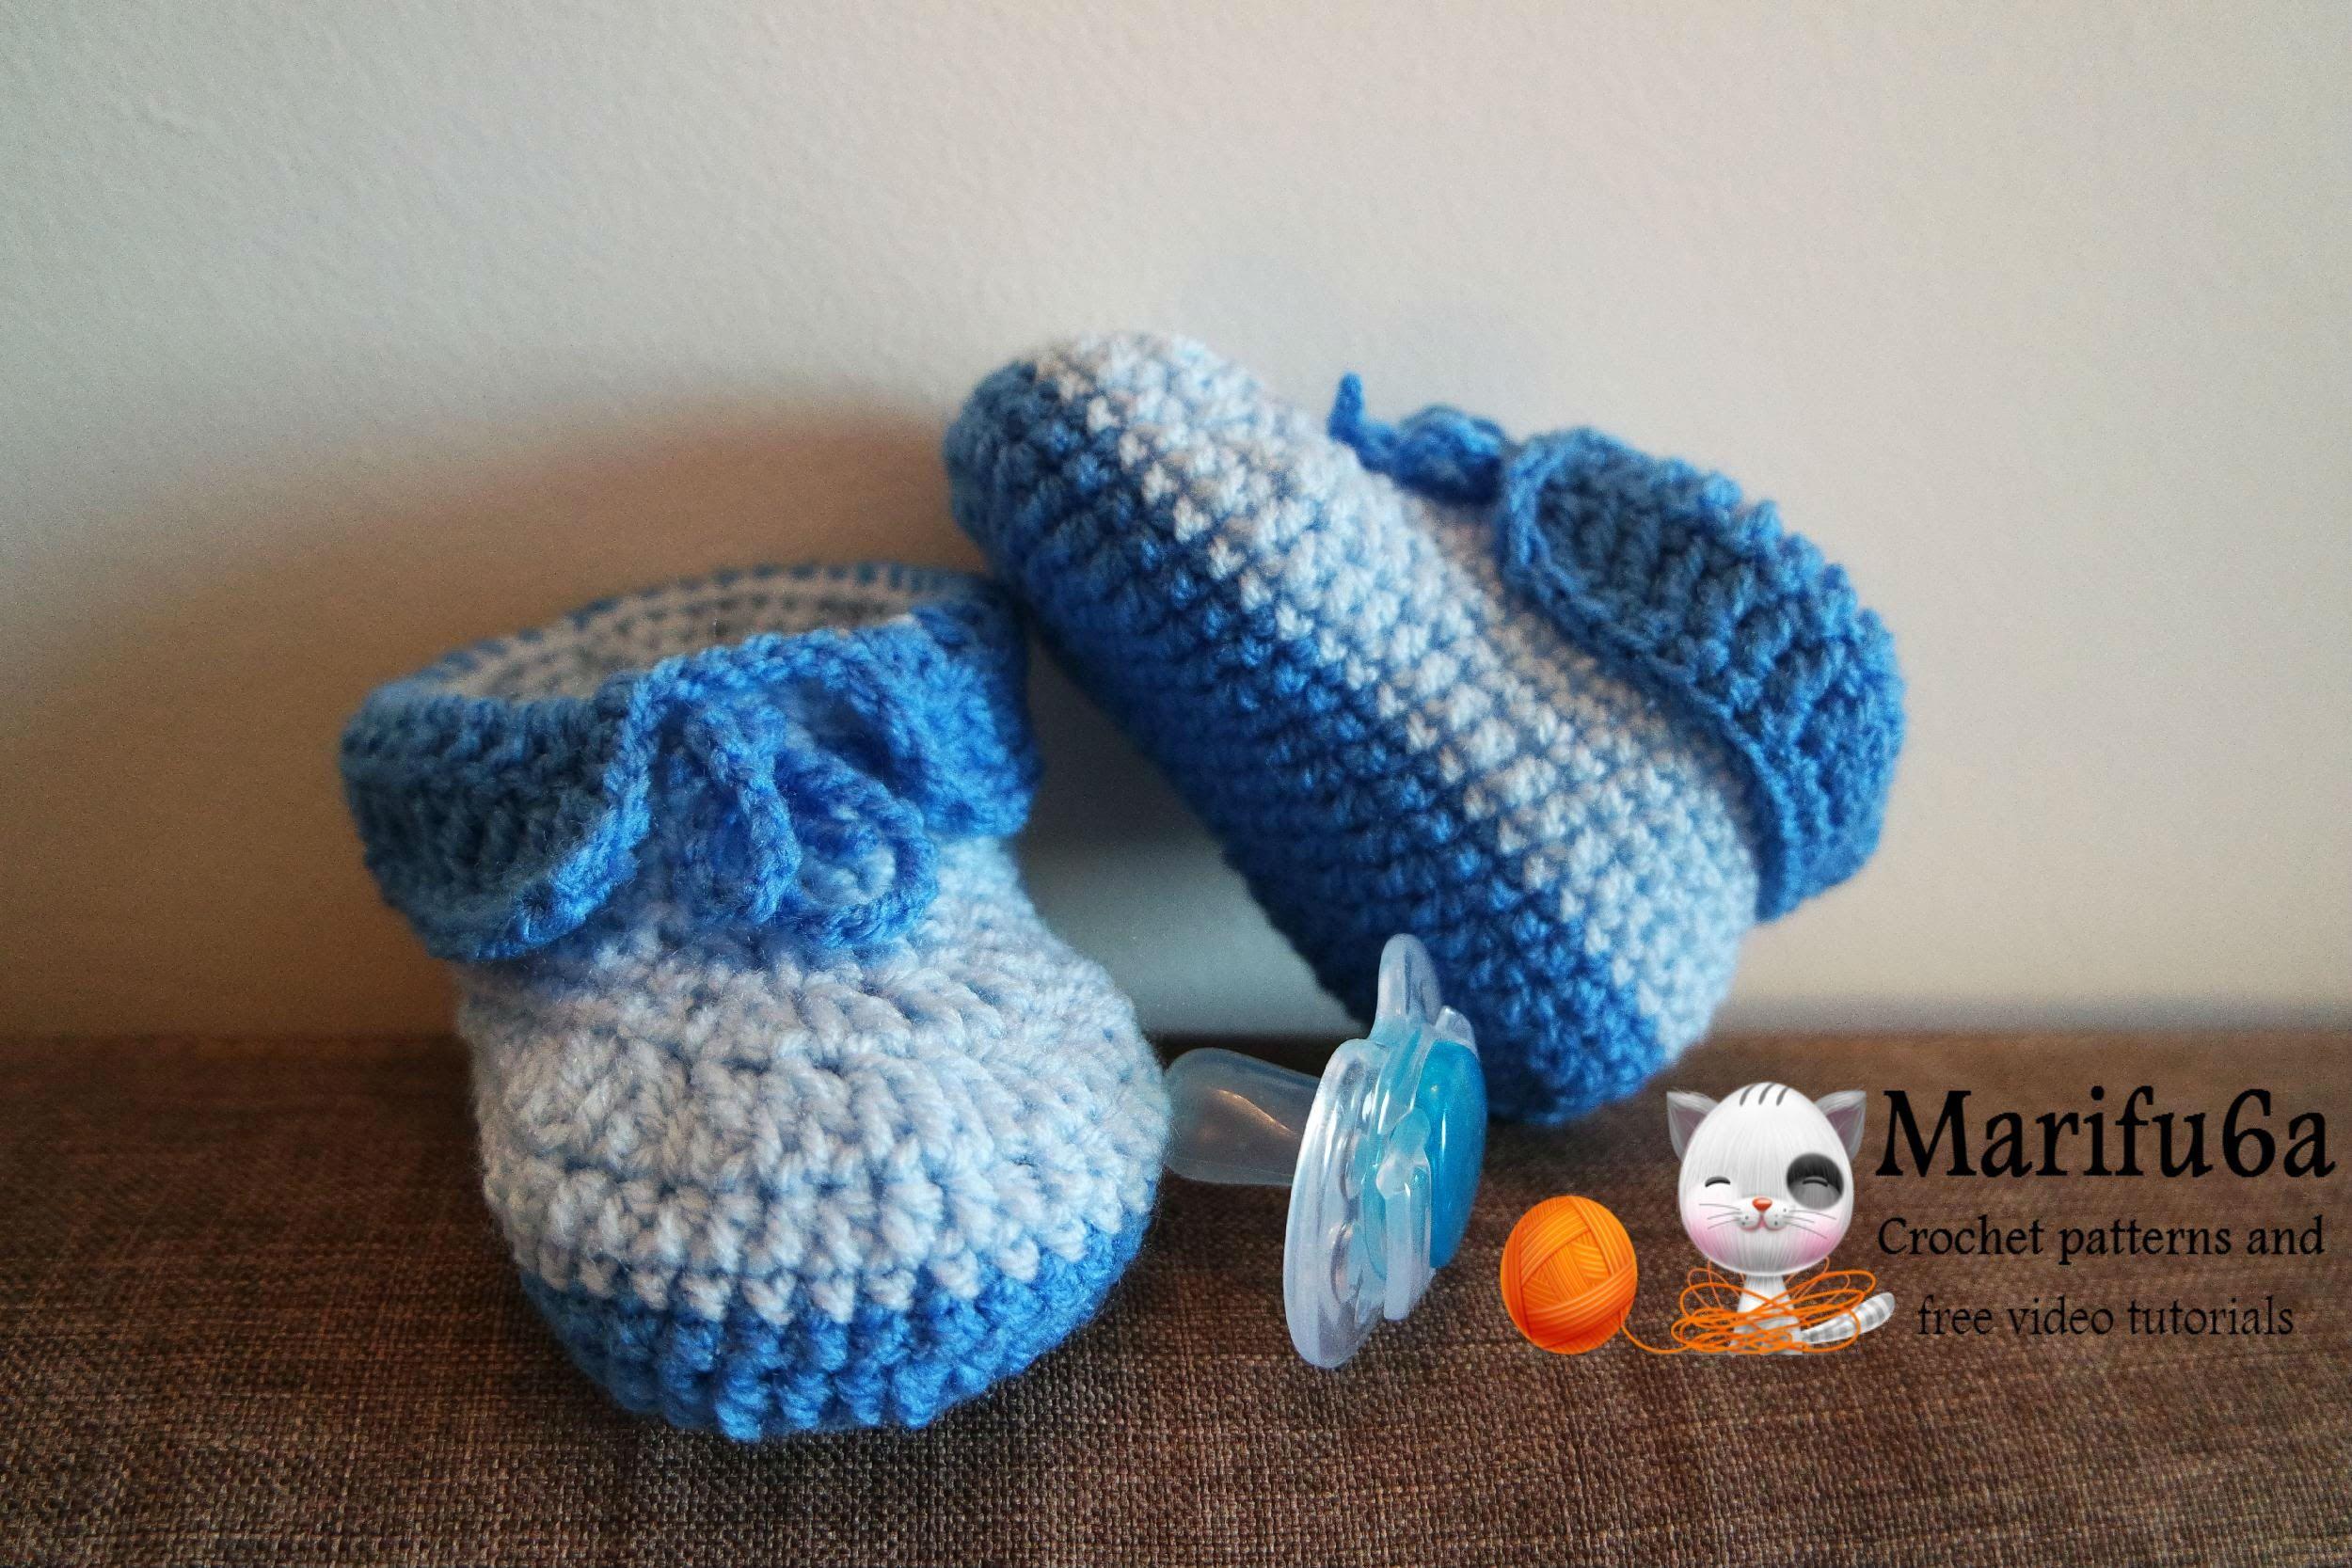 992ebc6baa239 How to crochet easy baby booties full free pattern | Crochet Booties ...